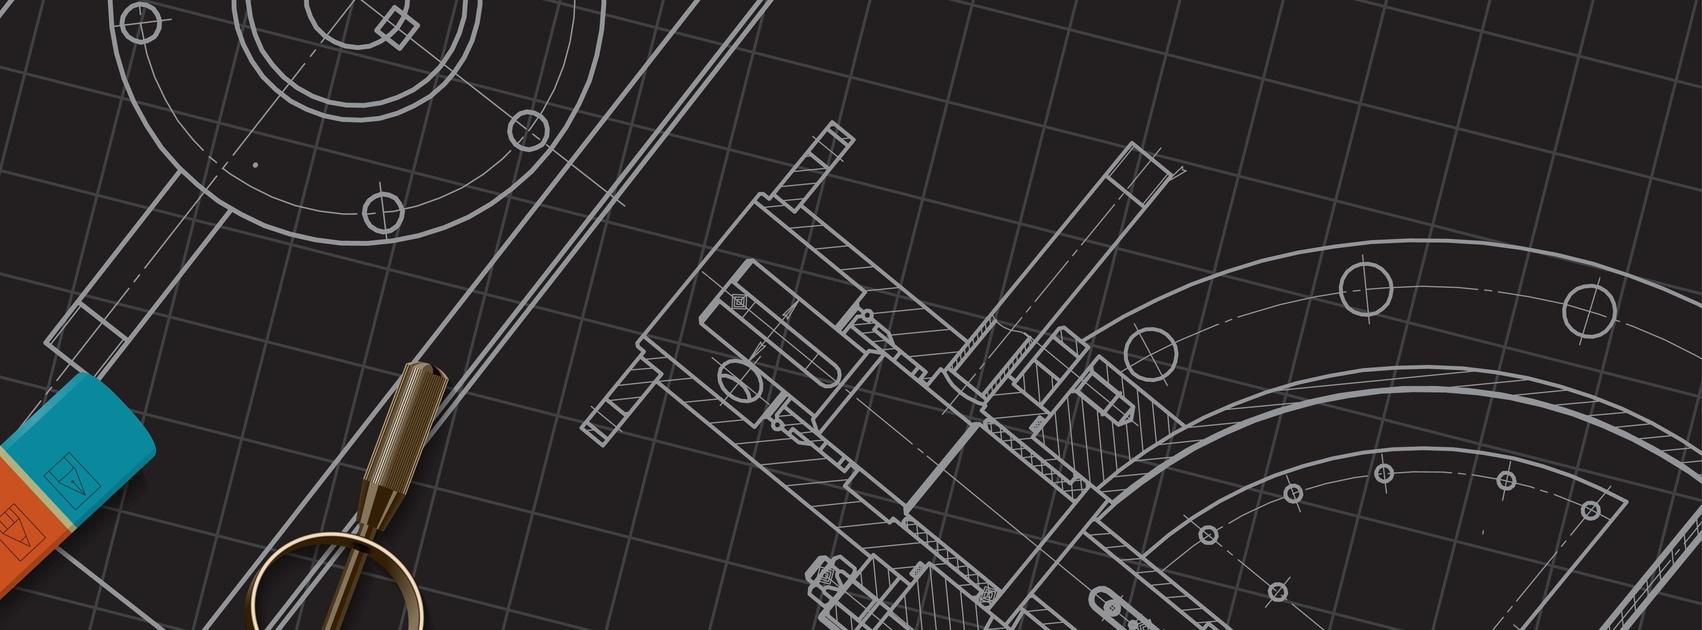 engenharia de producao.jpg